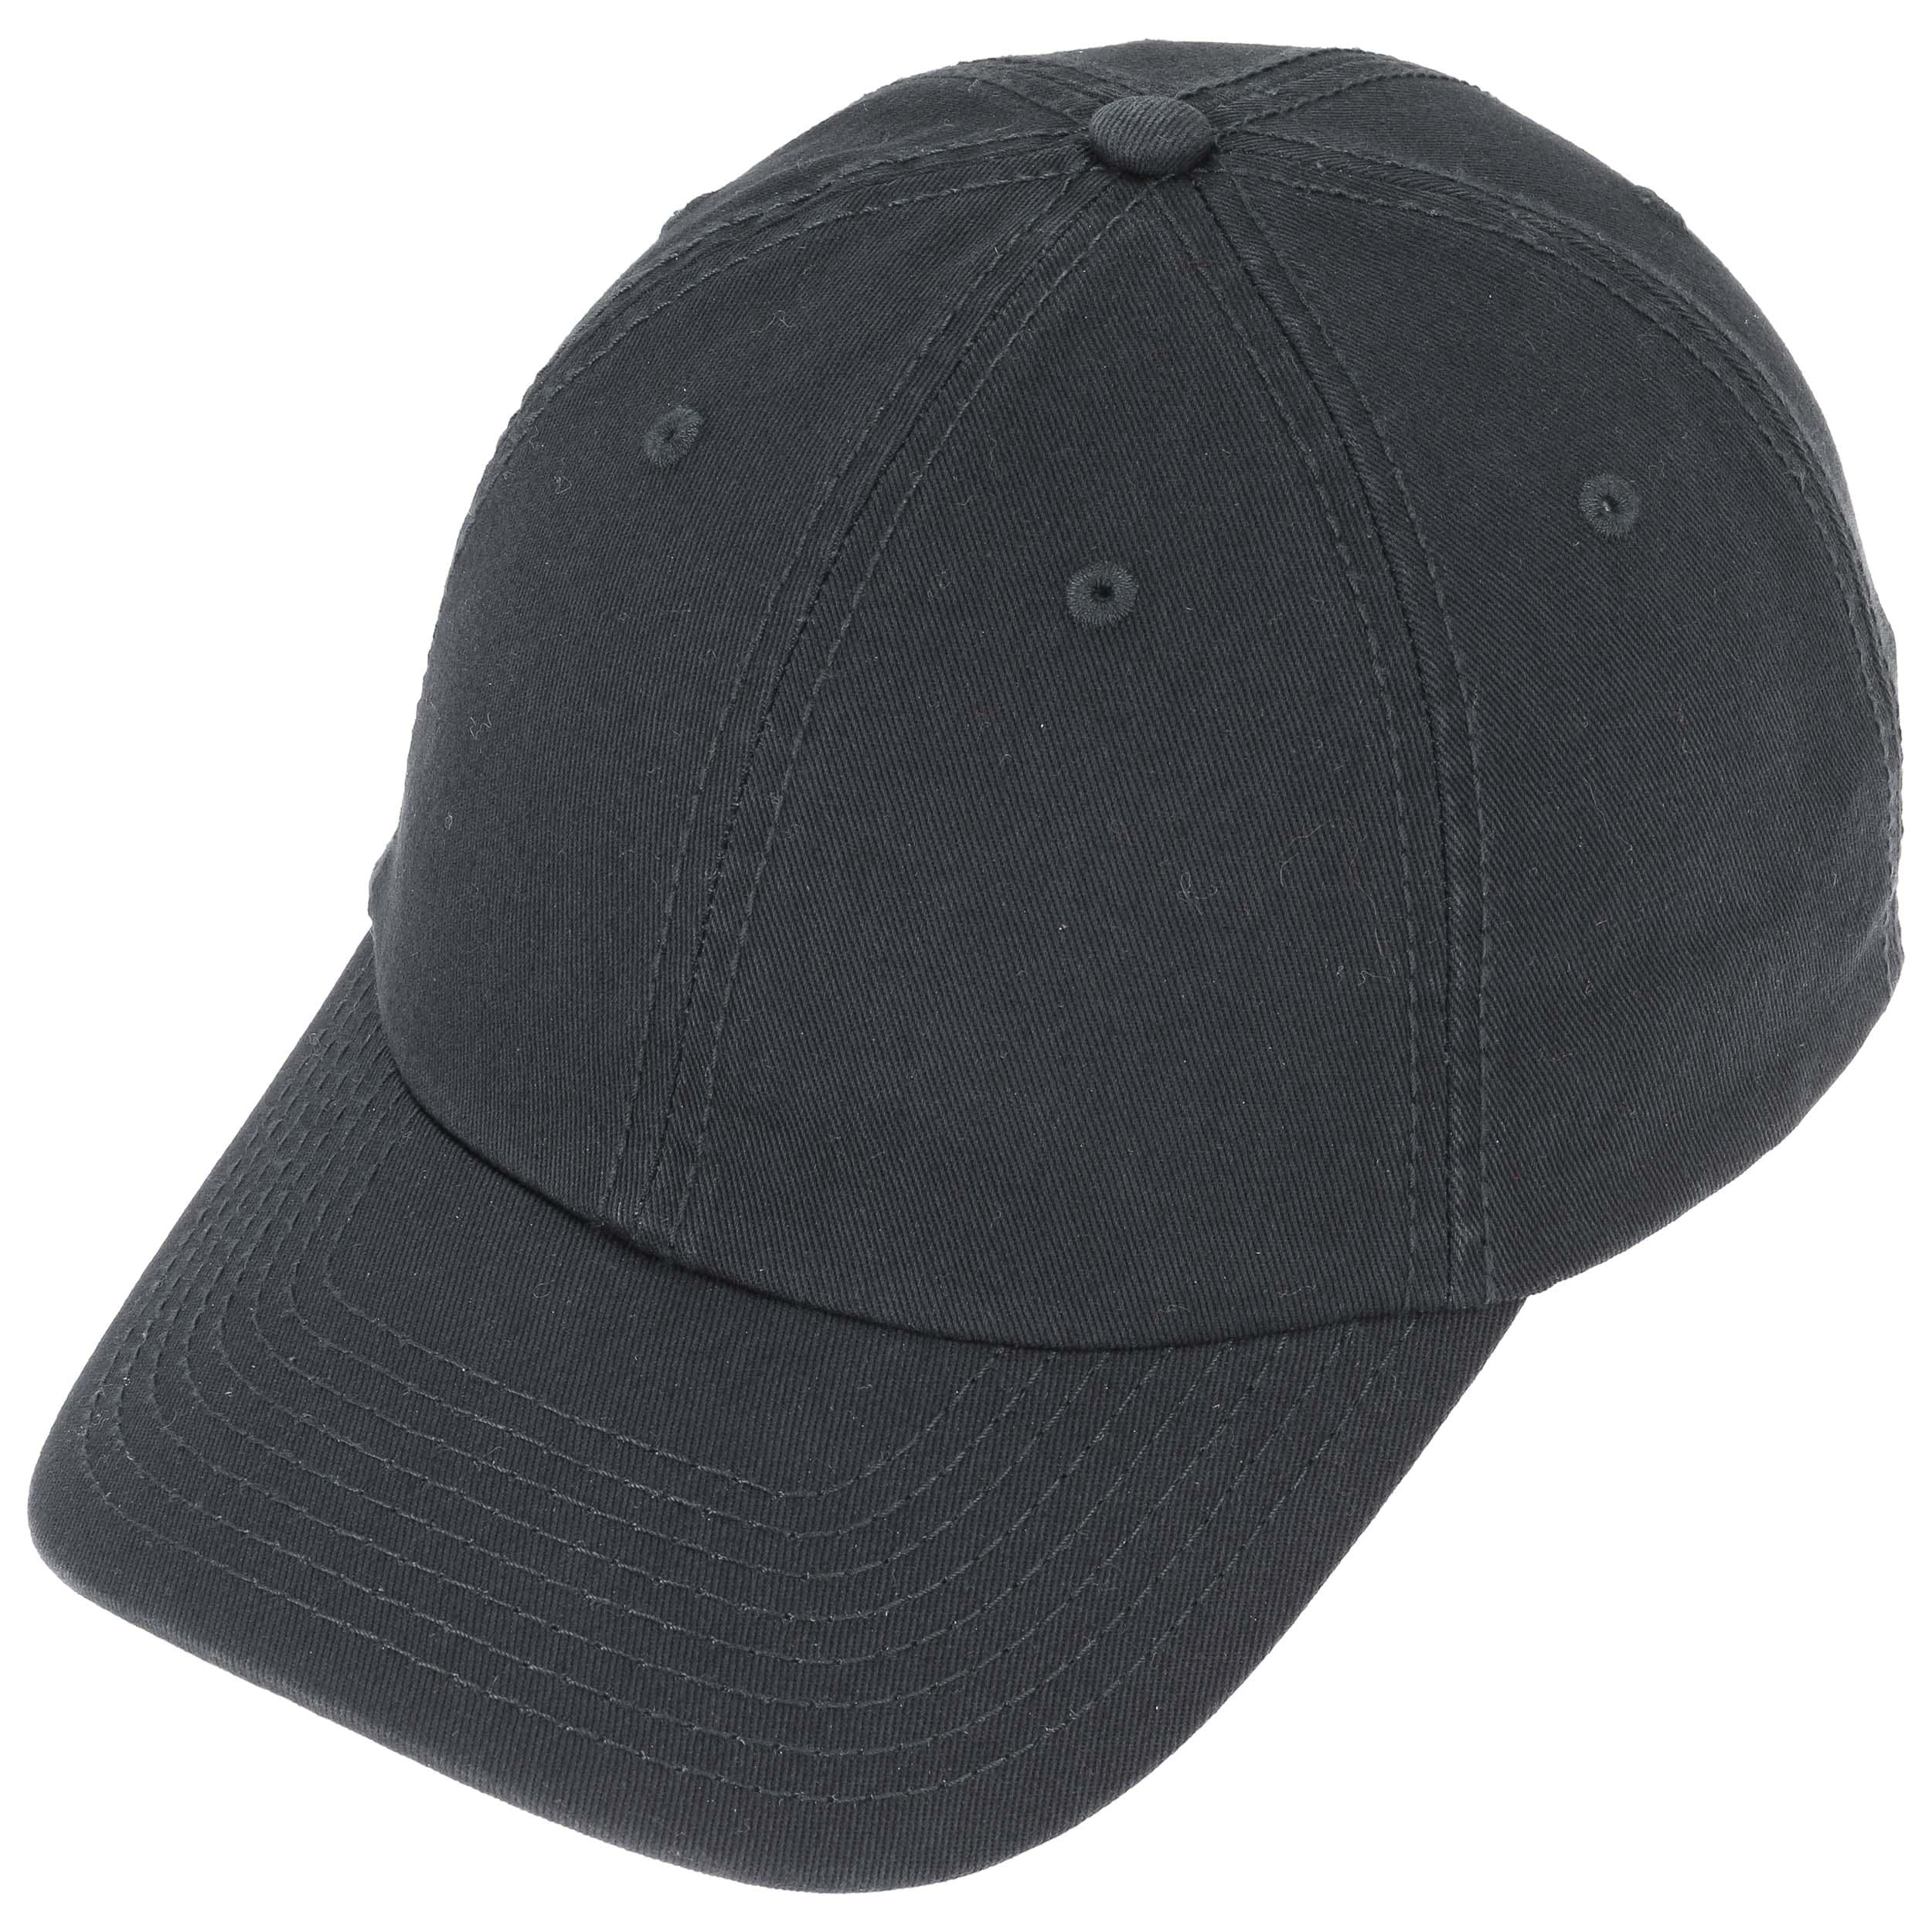 faa5622fb6fa8 ... Dad Hat Strapback Cap - navy 1 ...